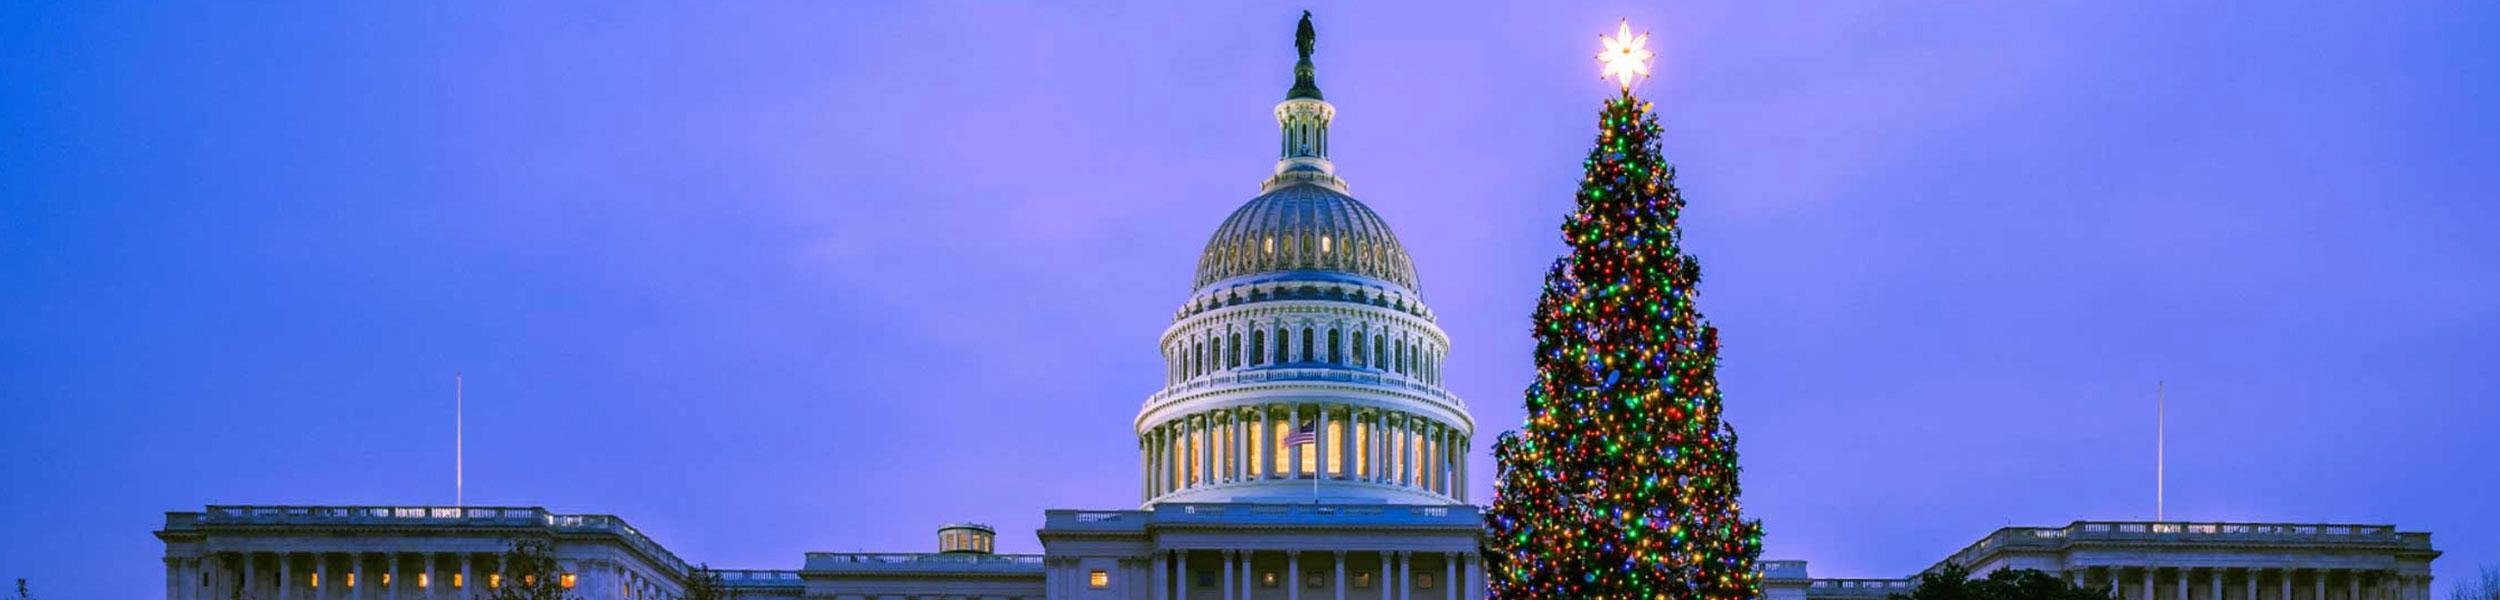 The U.S. Capitol Christmas Tree